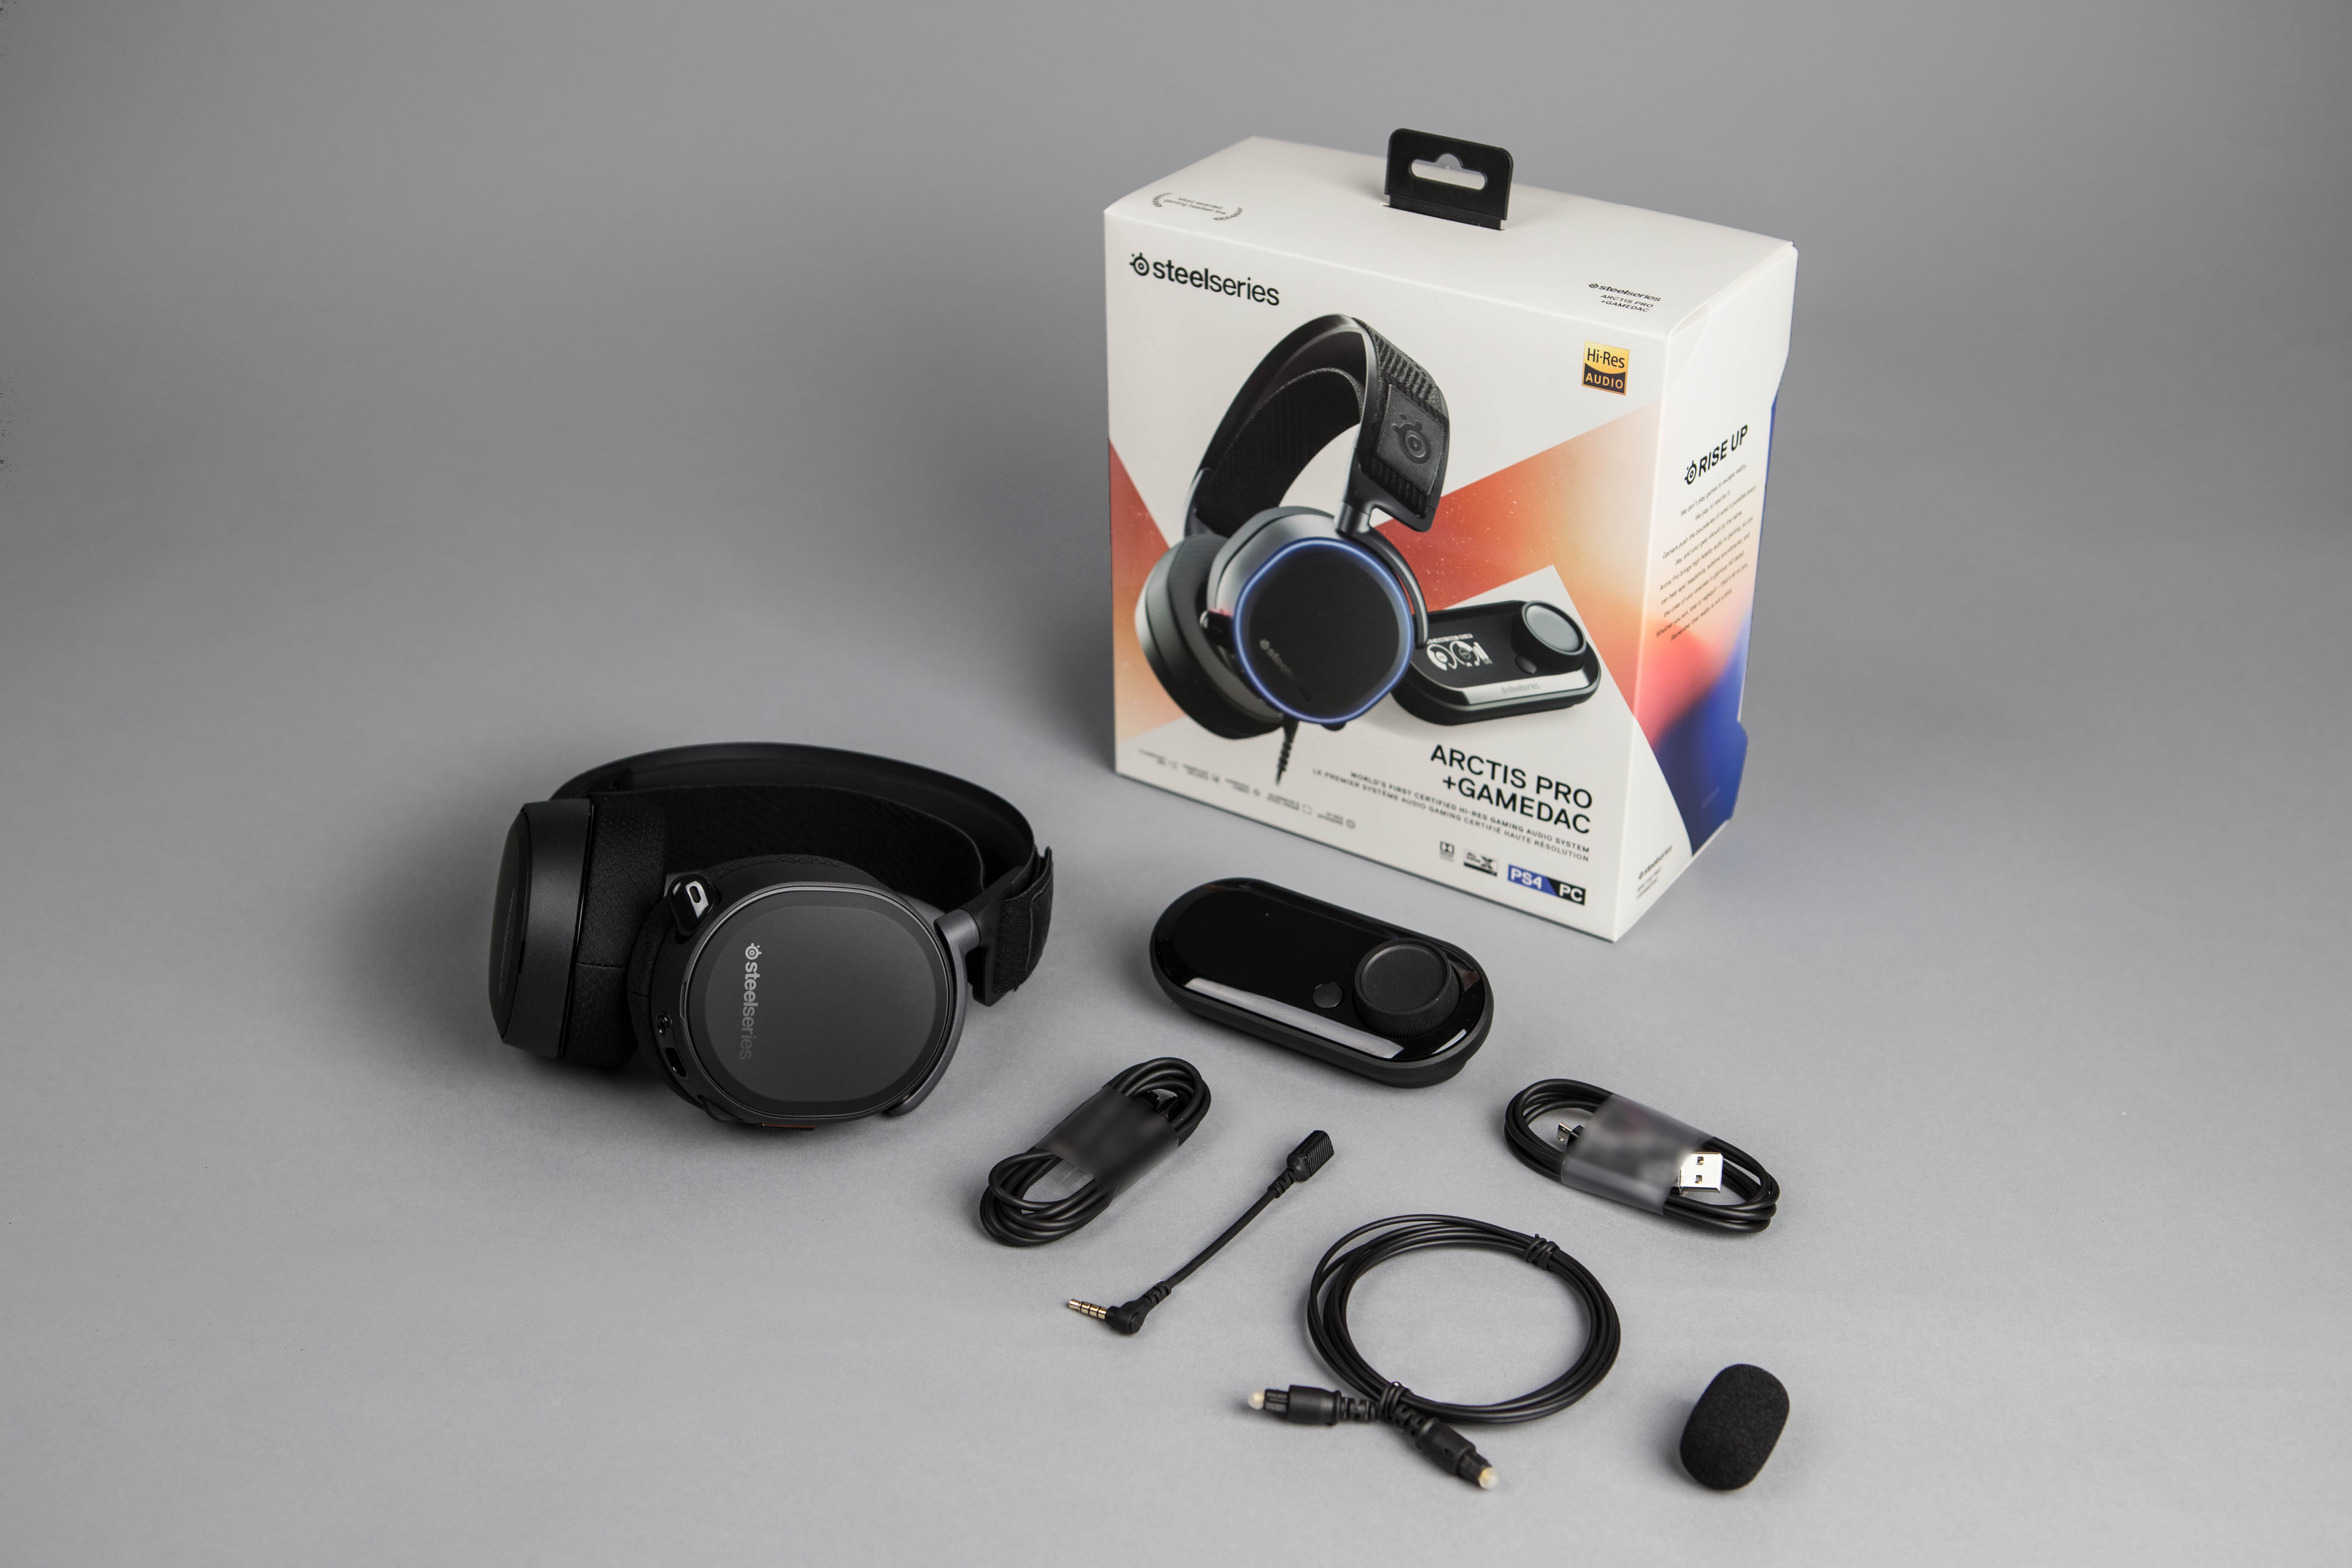 Arctis Pro Headset - The SteelSeries Arctis Pro Gaming